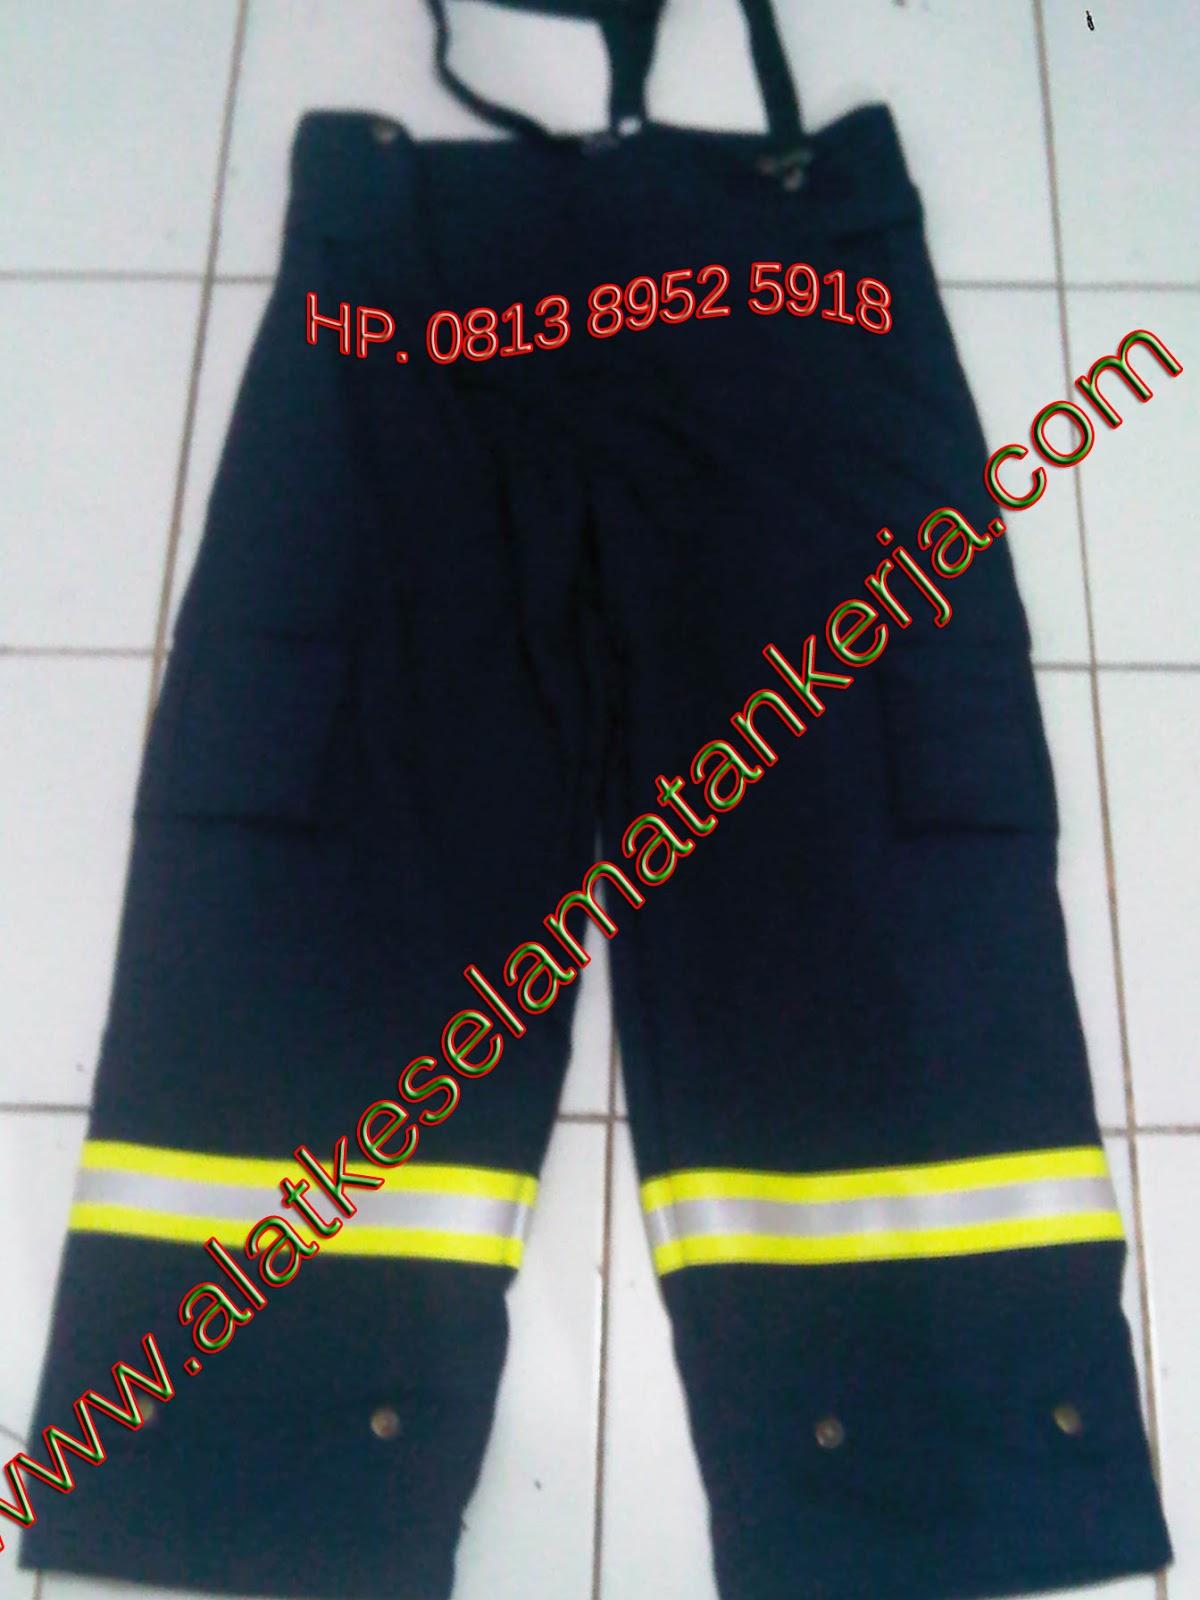 Menjual banyak sekali Baju pemadam kebakaran NOMEXIIIA BAJU PEMADAM KEBAKARAN NOMEXIIIA